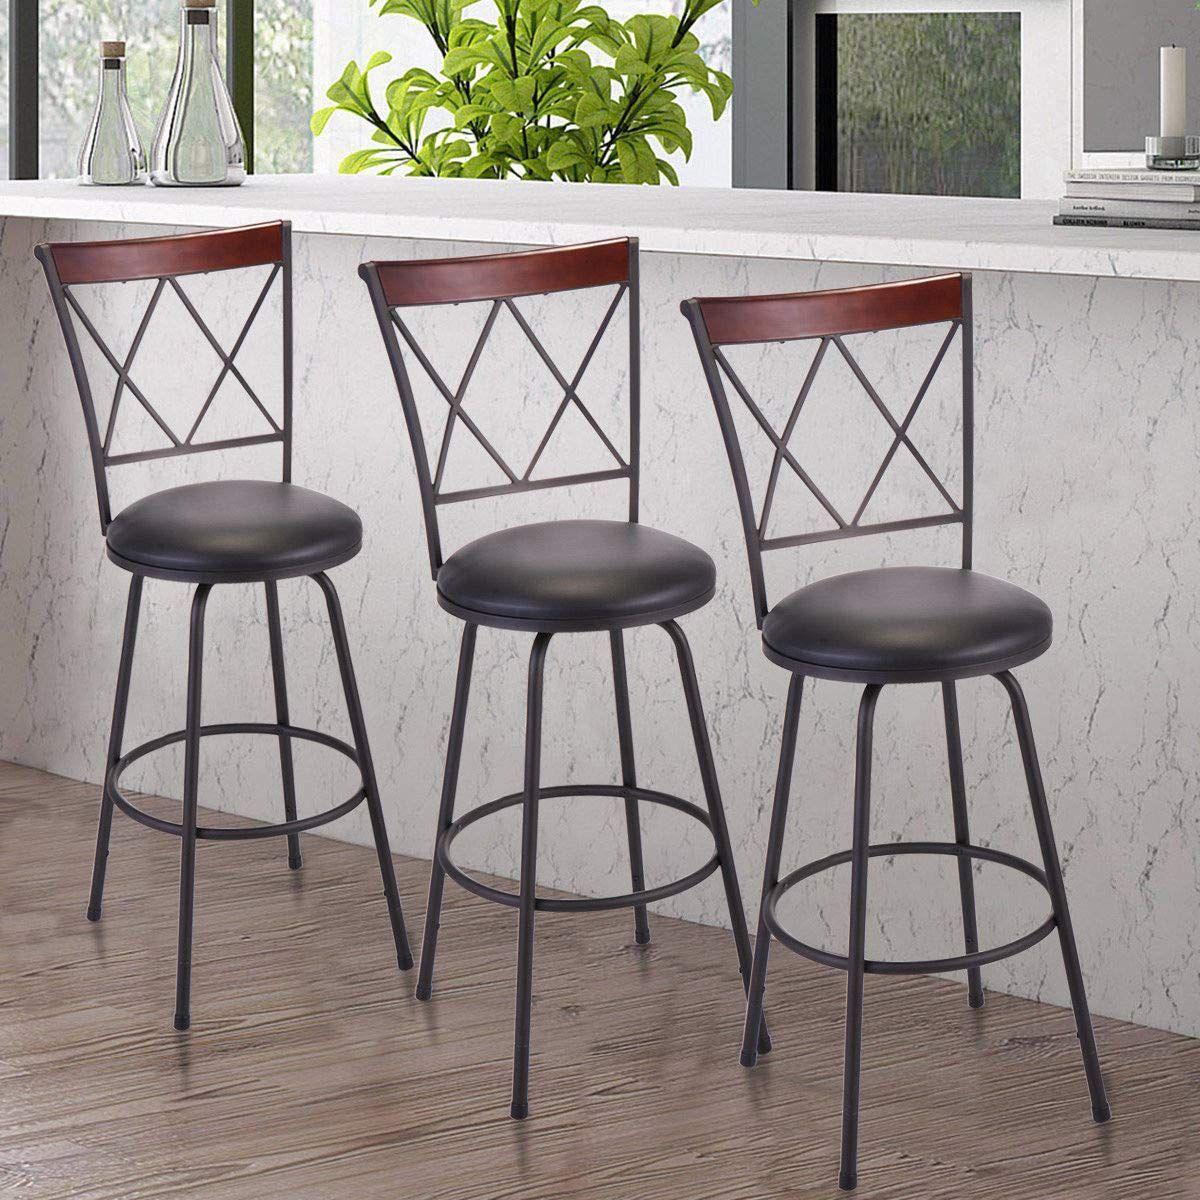 Set Of 3 Modern High Back Swivel Bar Stool Height Chair Counter Bistro Pub Chair Swivel Bar Stools Bar Stools Pub Chairs